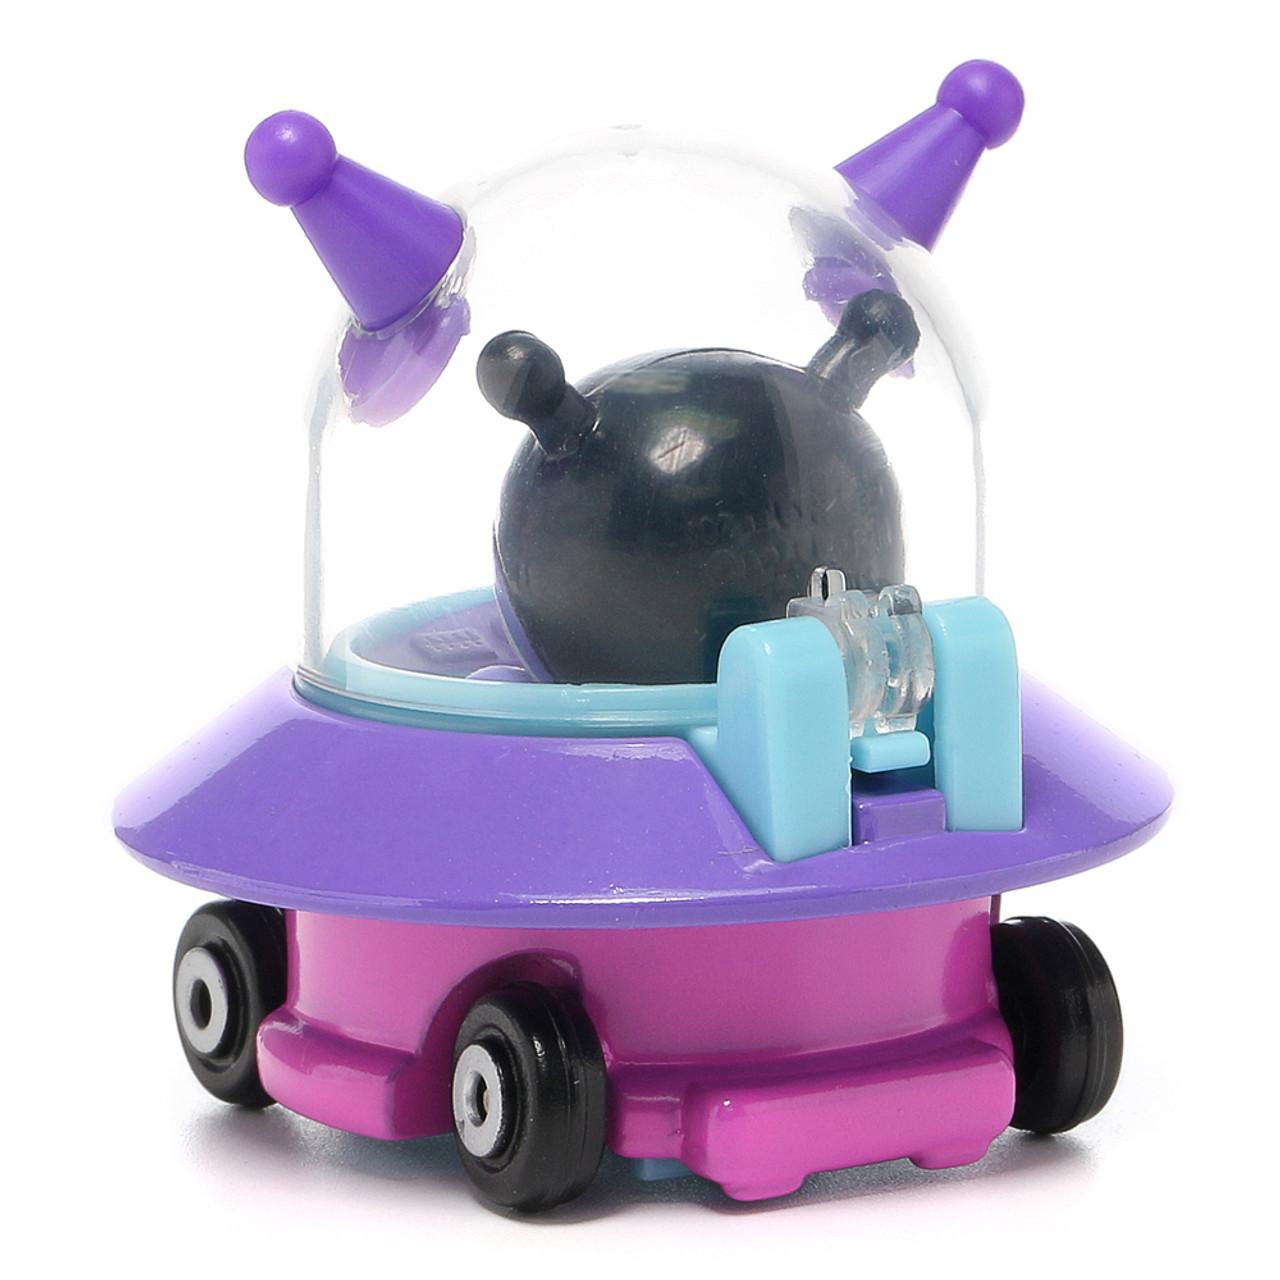 Sega Toys Anpanman Museum Go Go Mini Vehicle Carry Hero - Baikinman Germ UFO car ( Back View )